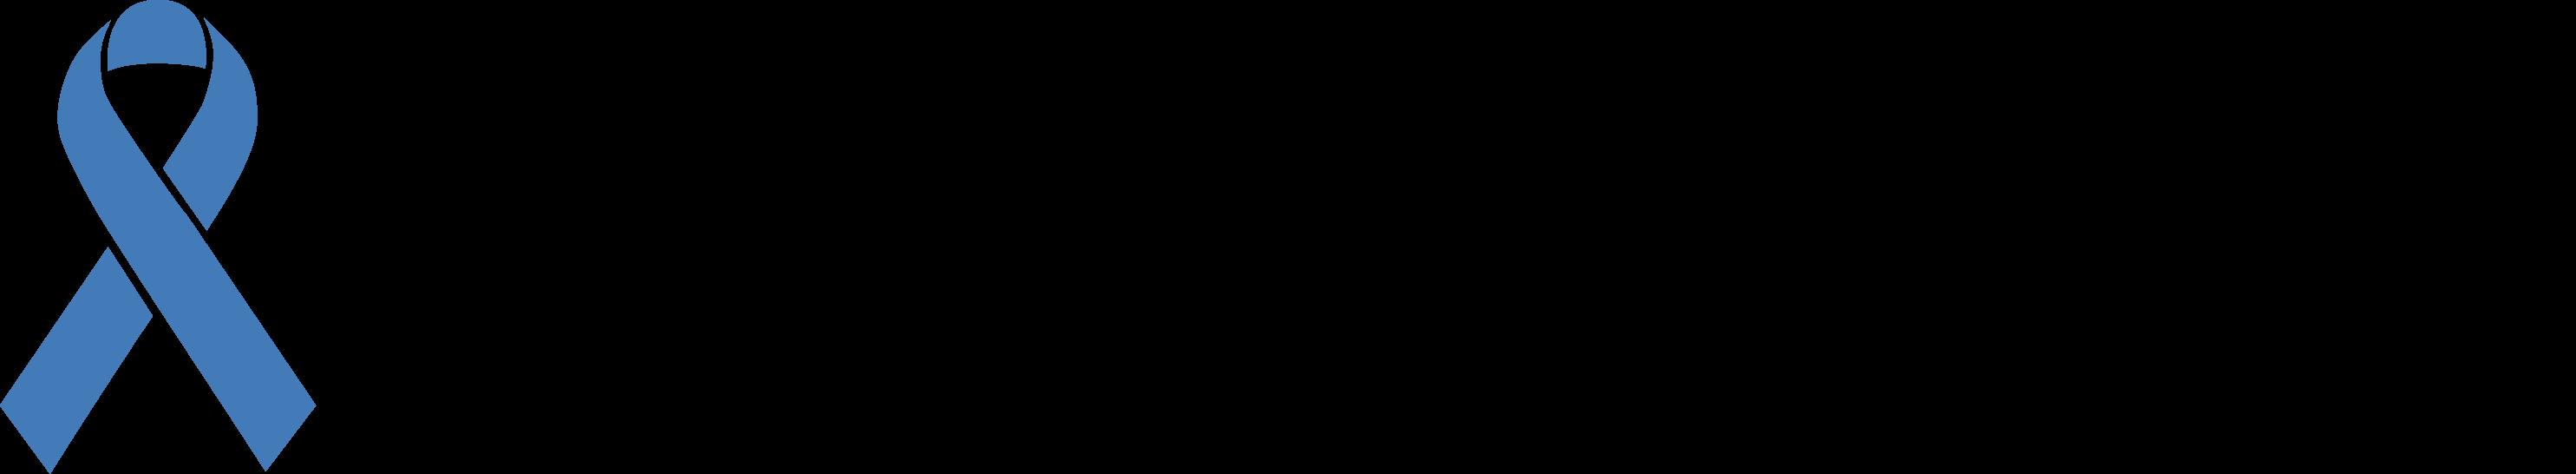 LED lampa Mustaschkampen Prostatacancerförbundets Webshop